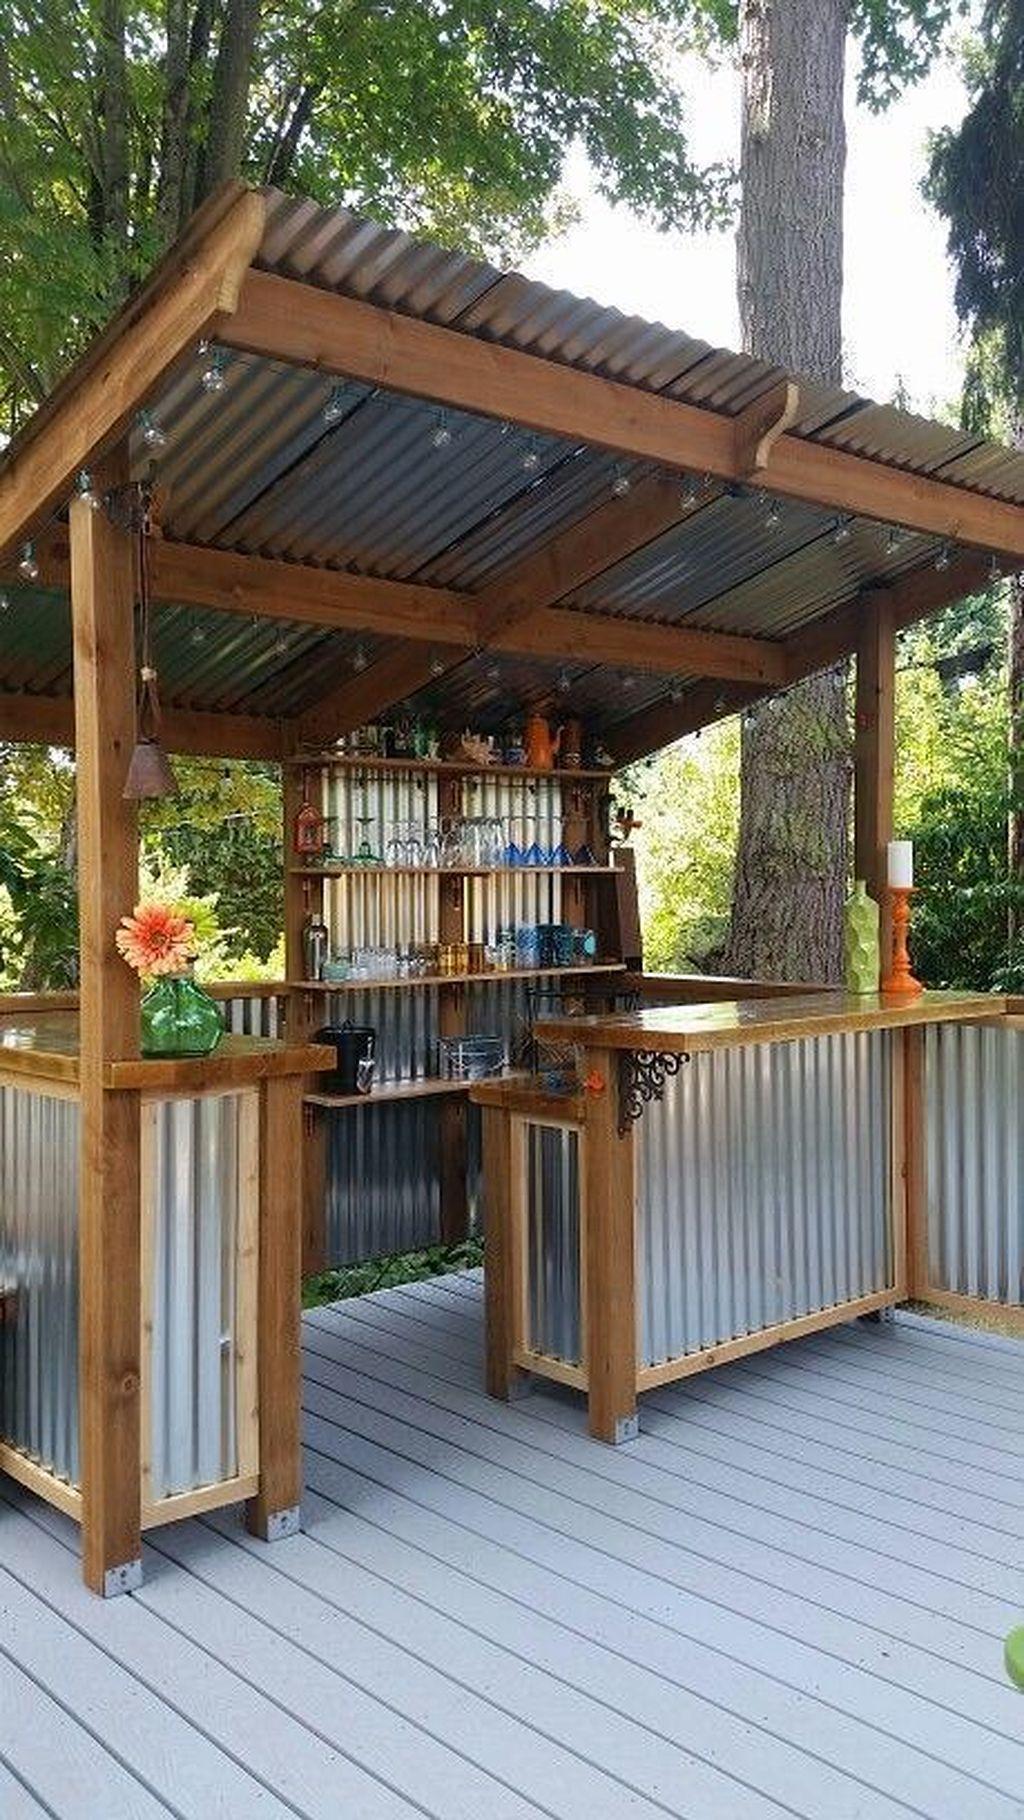 20 backyard ideas on a budget backyard budgeting and low